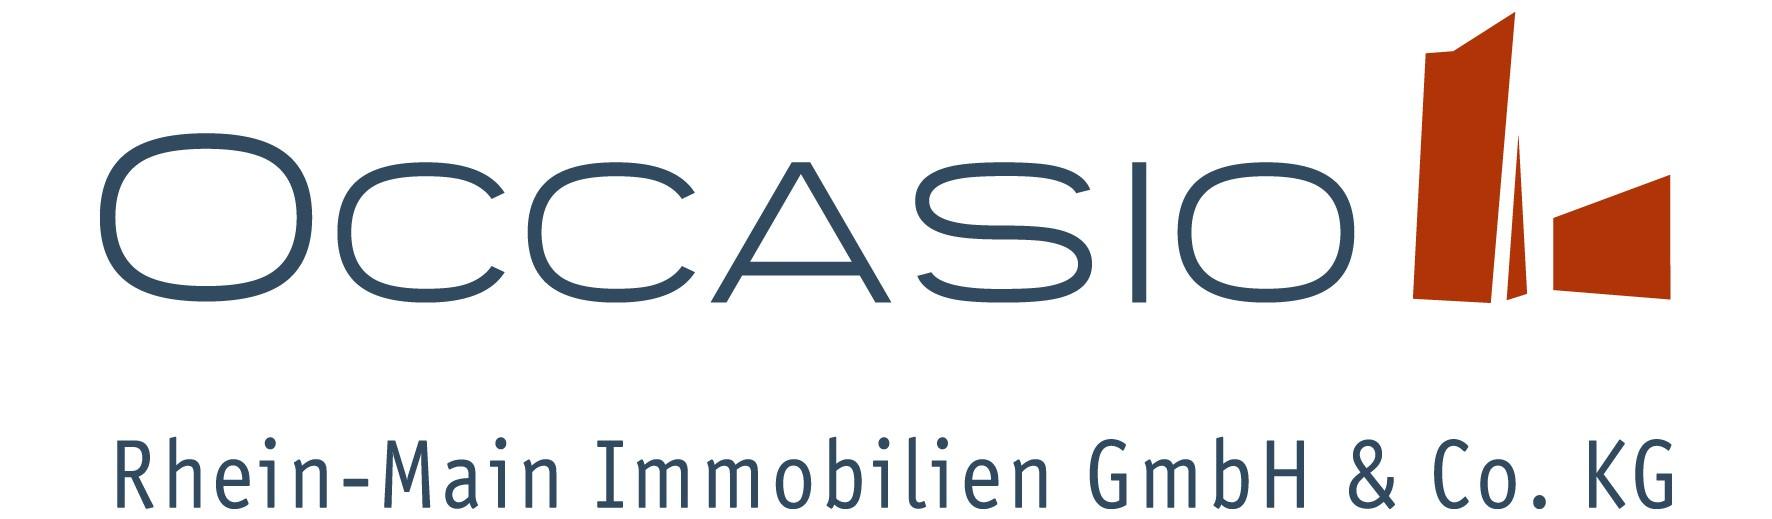 occasio_logo